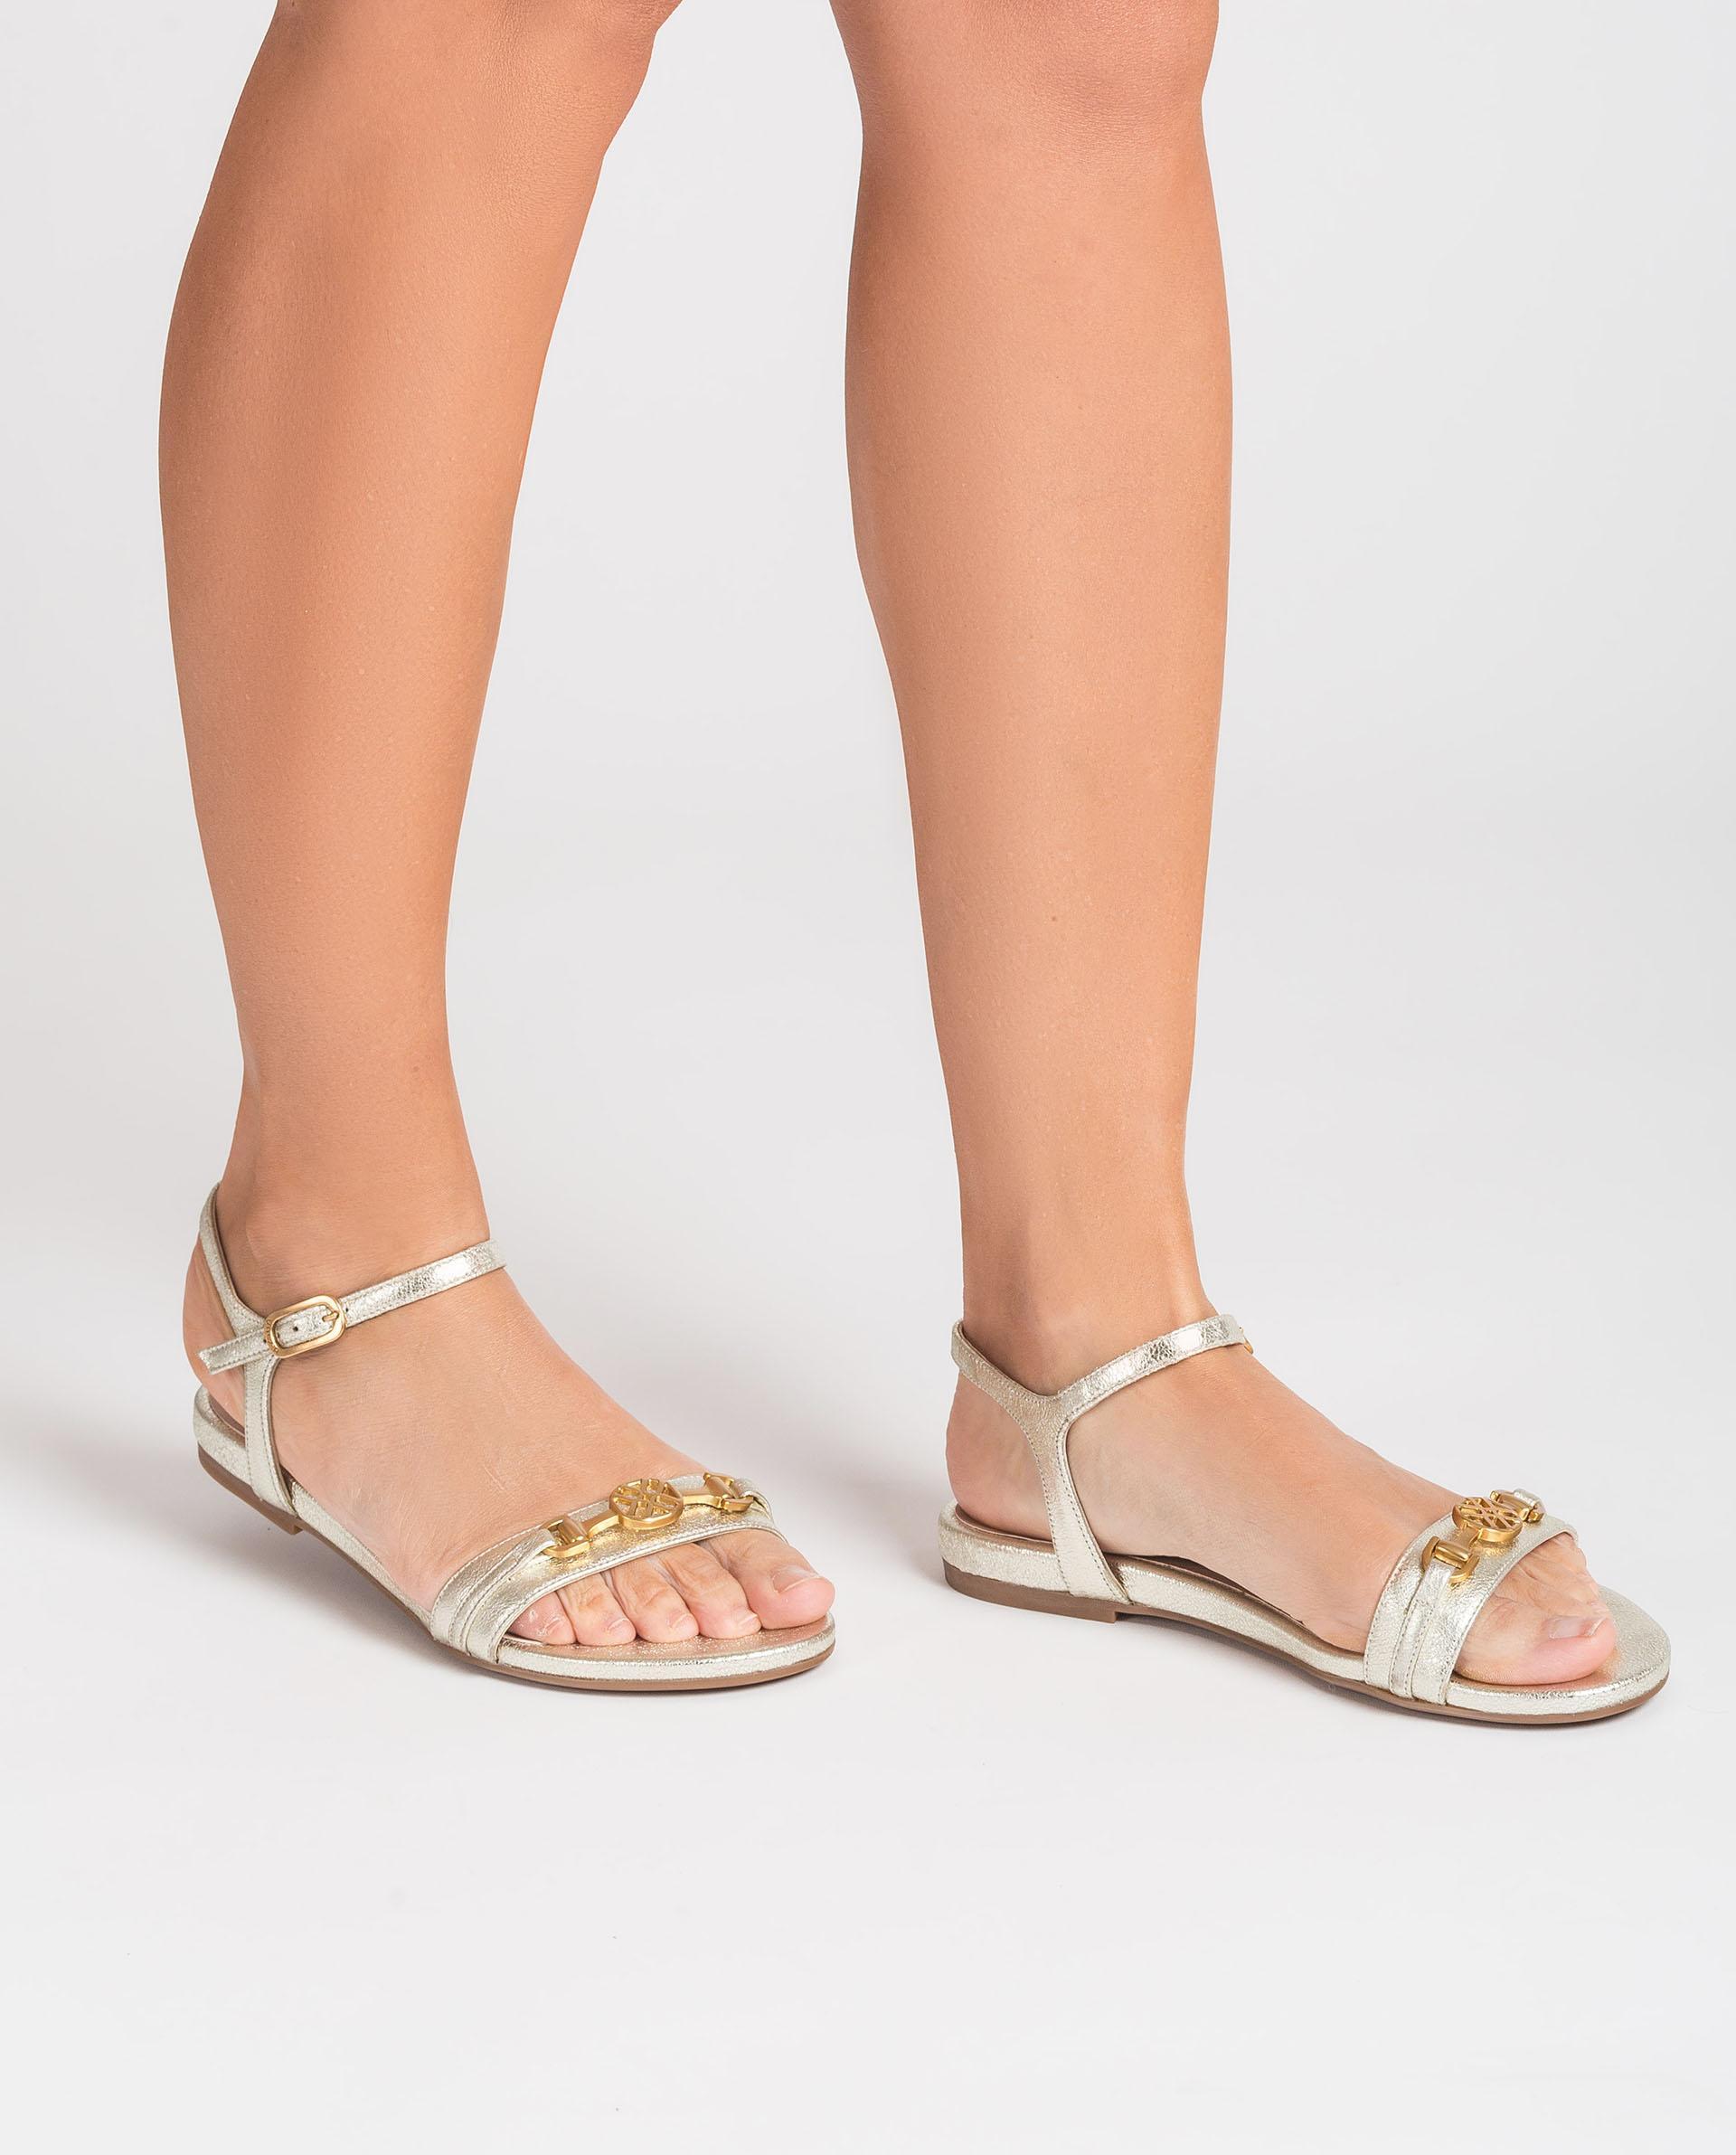 UNISA Flache Sandalen aus glänzendem Leder CARIMO_SE 5